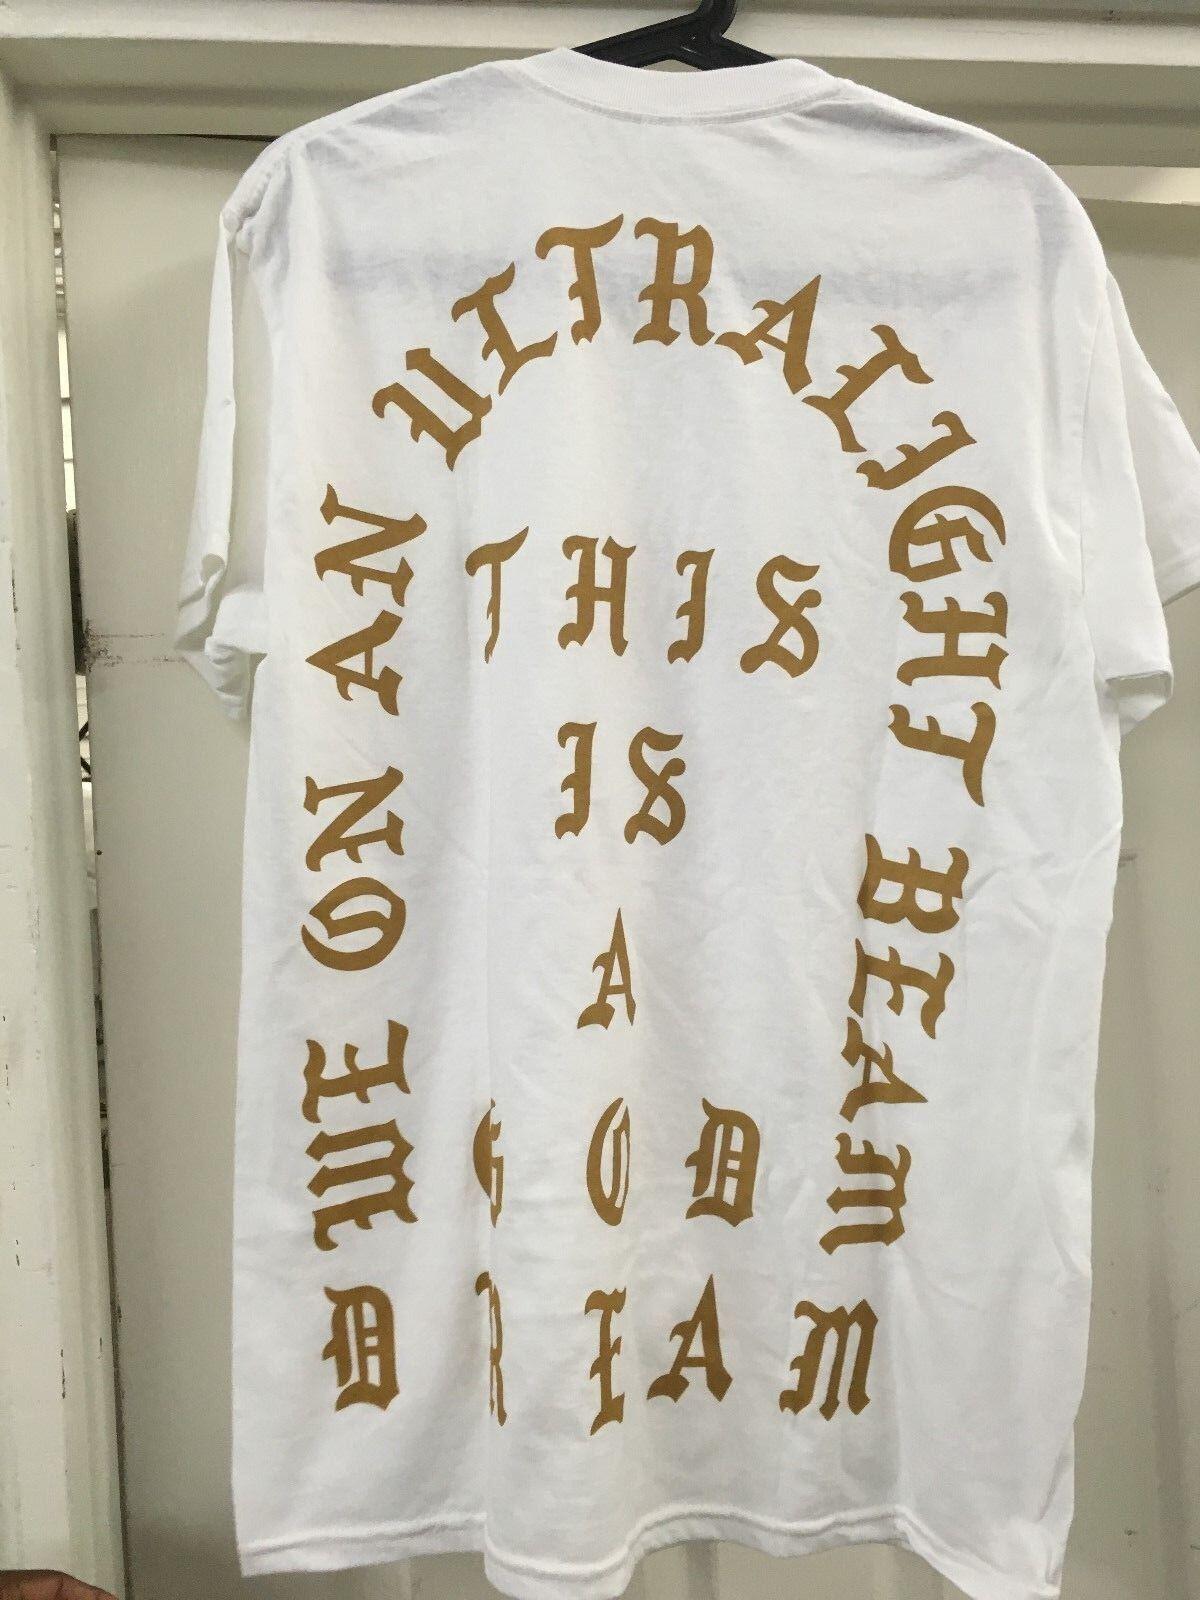 KANYE WEST LOS ANGELES GOD DREAM T-SHIRT Weiß Sz M-XL 2016 PABLO